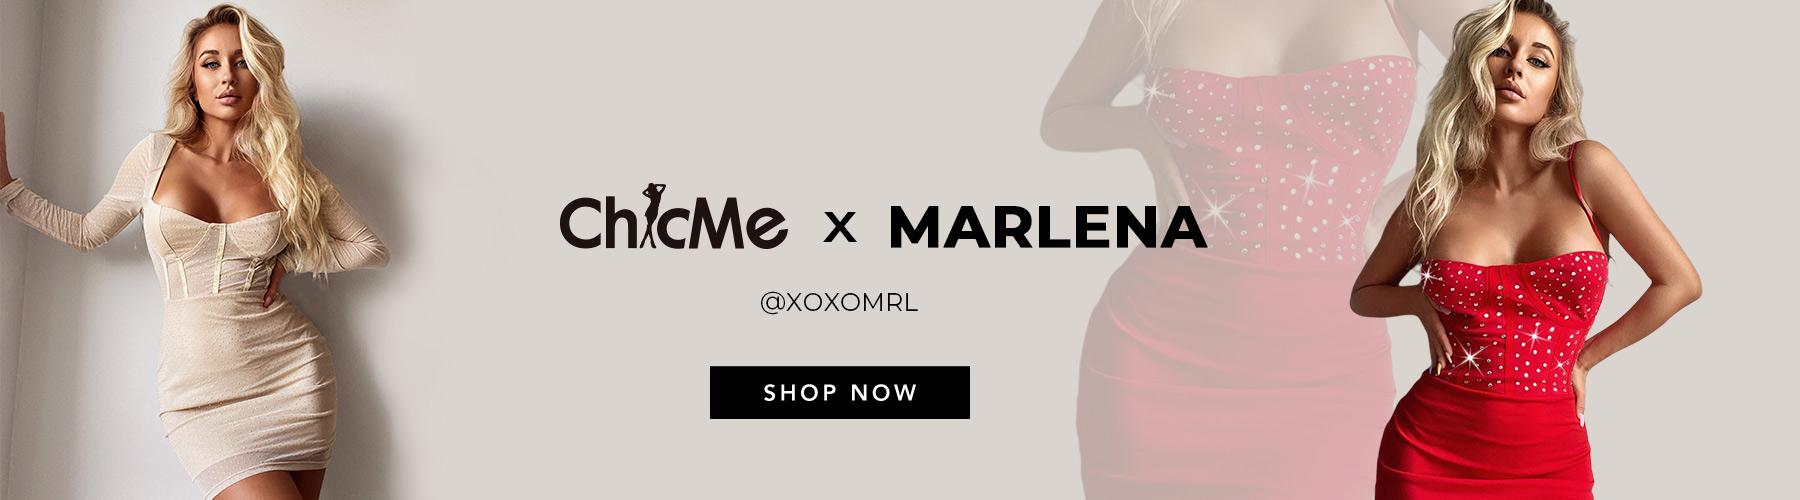 CHICME X Marlena